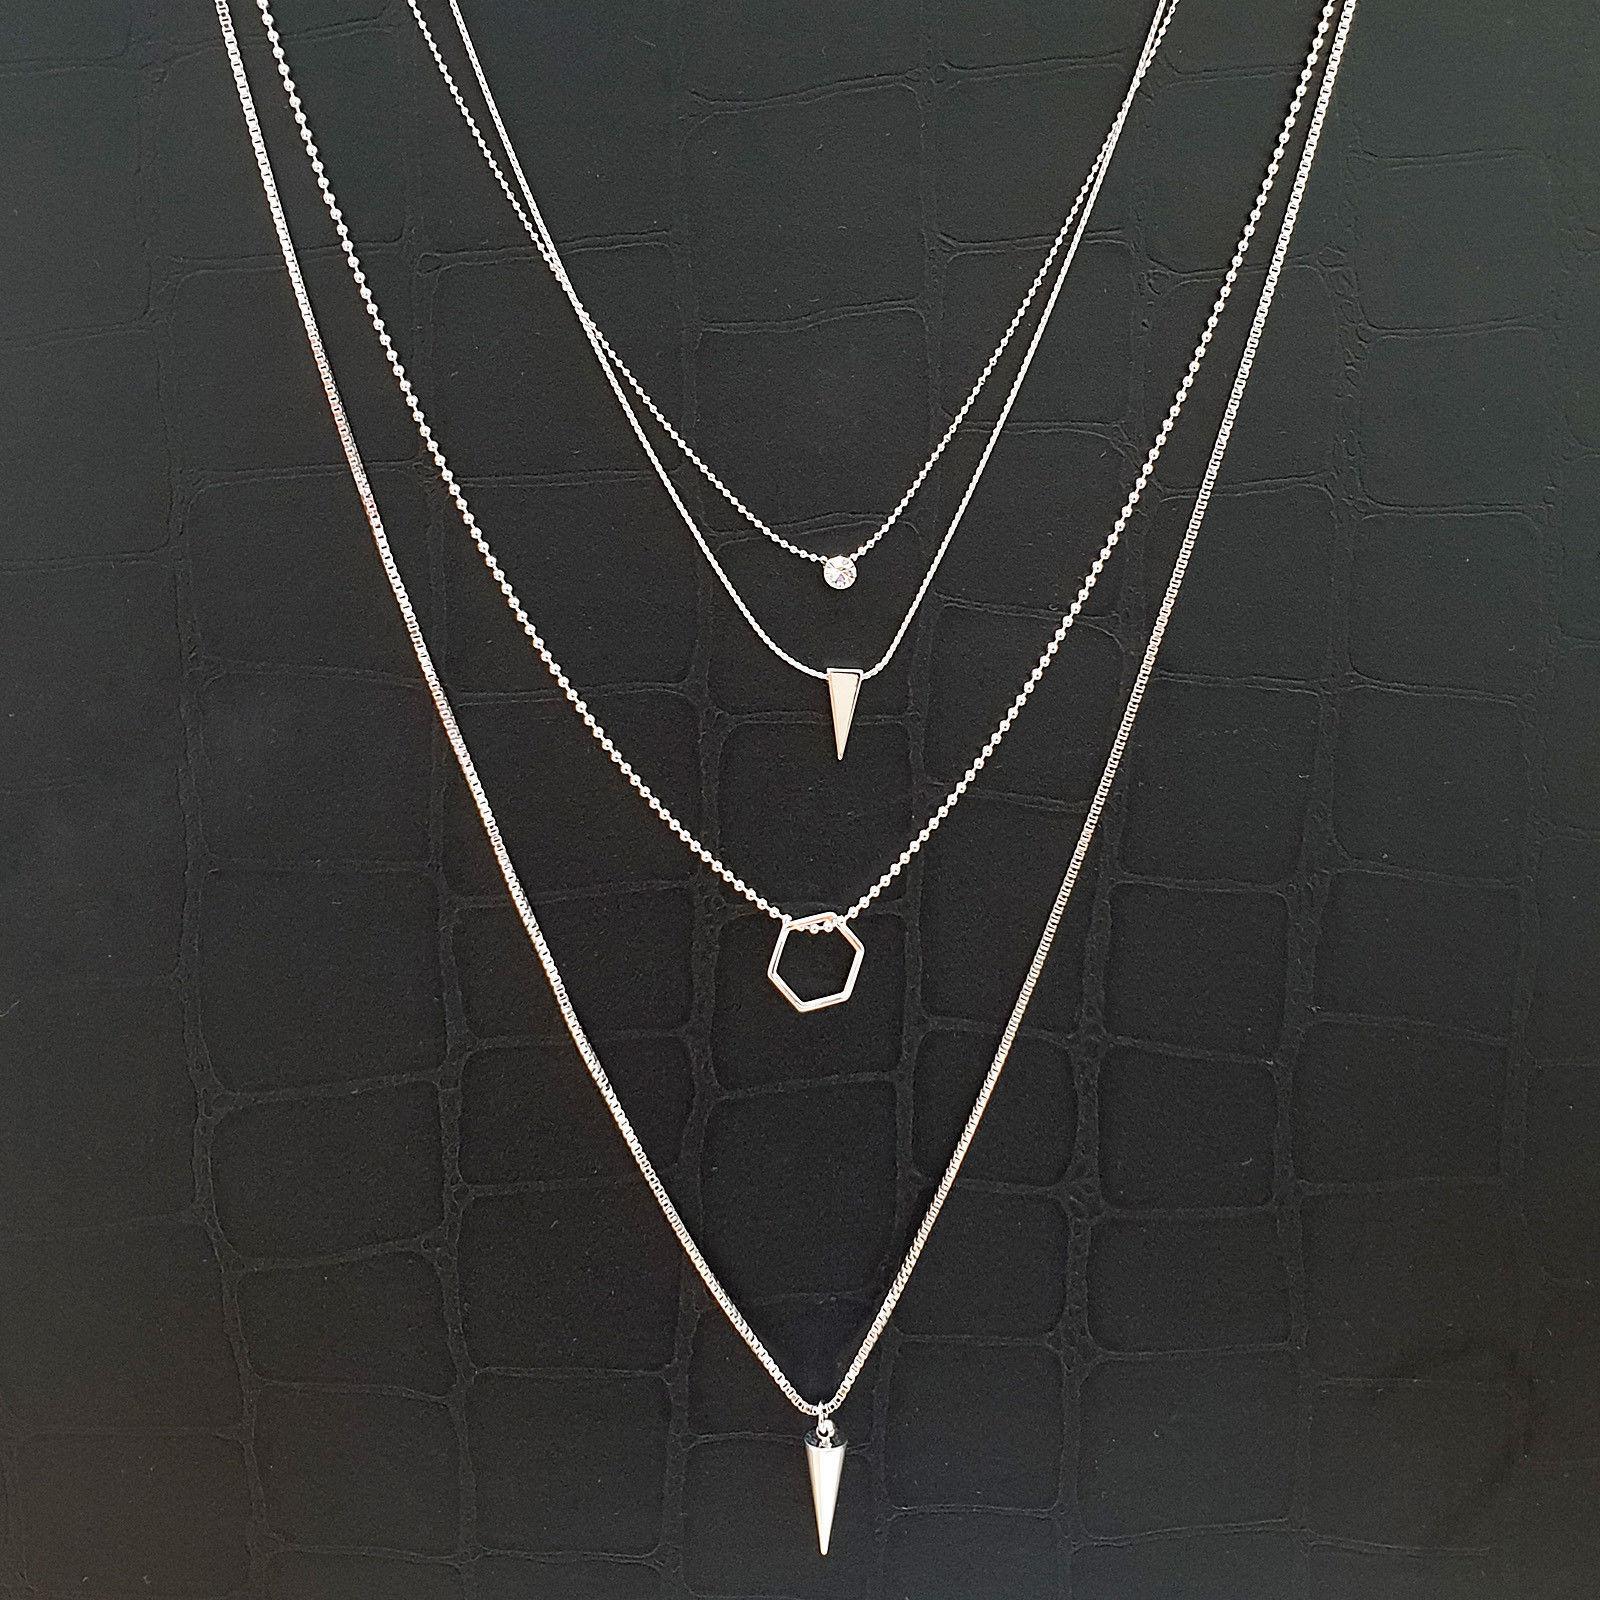 4 Layer Multi-Strand Necklace Choker Rhinestone Circle Hexagon Triangle Cone N16